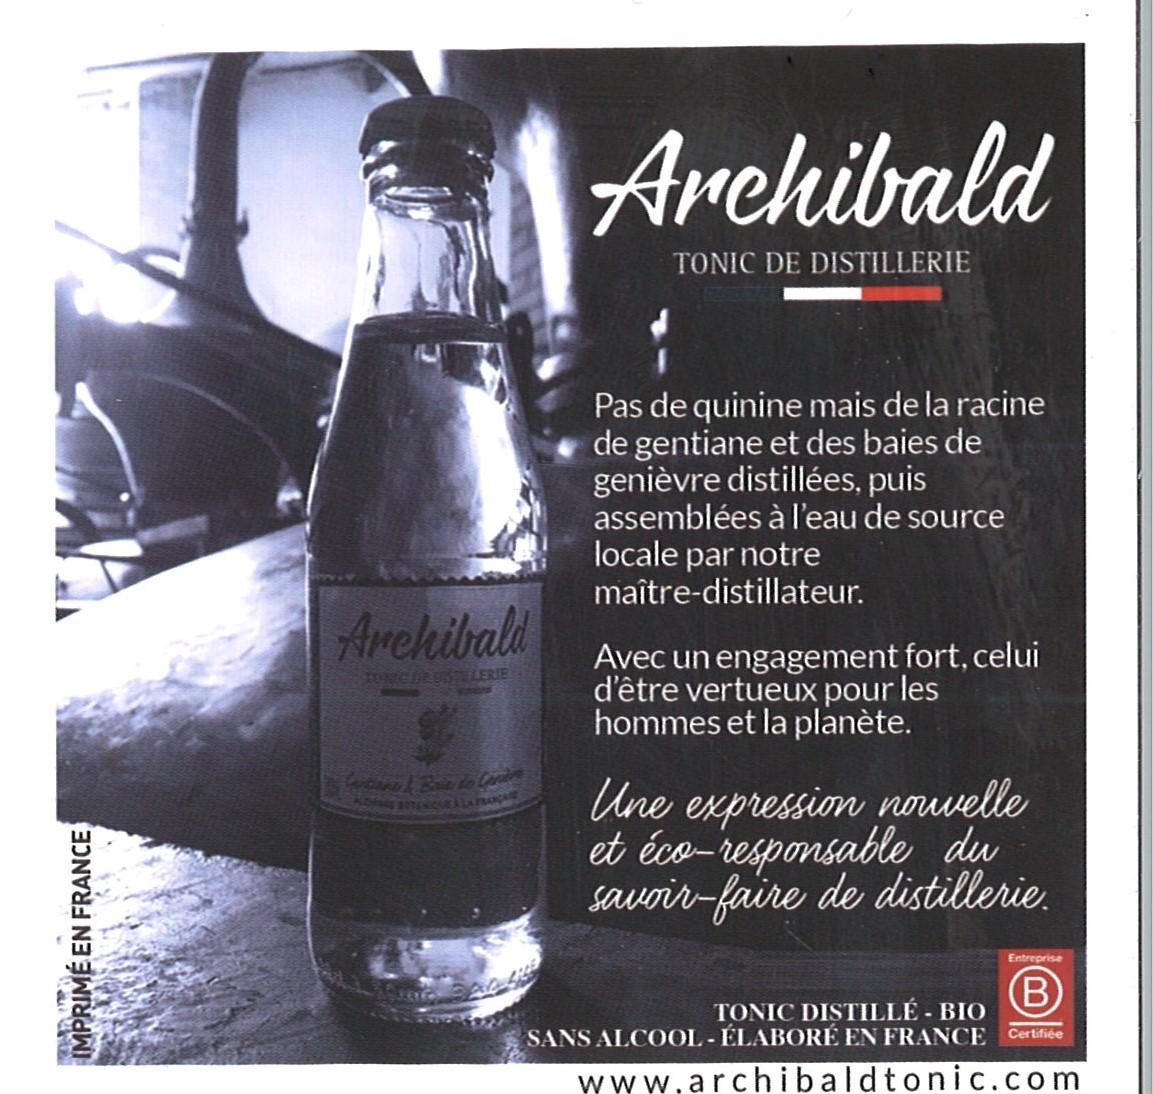 Tonic Archibald